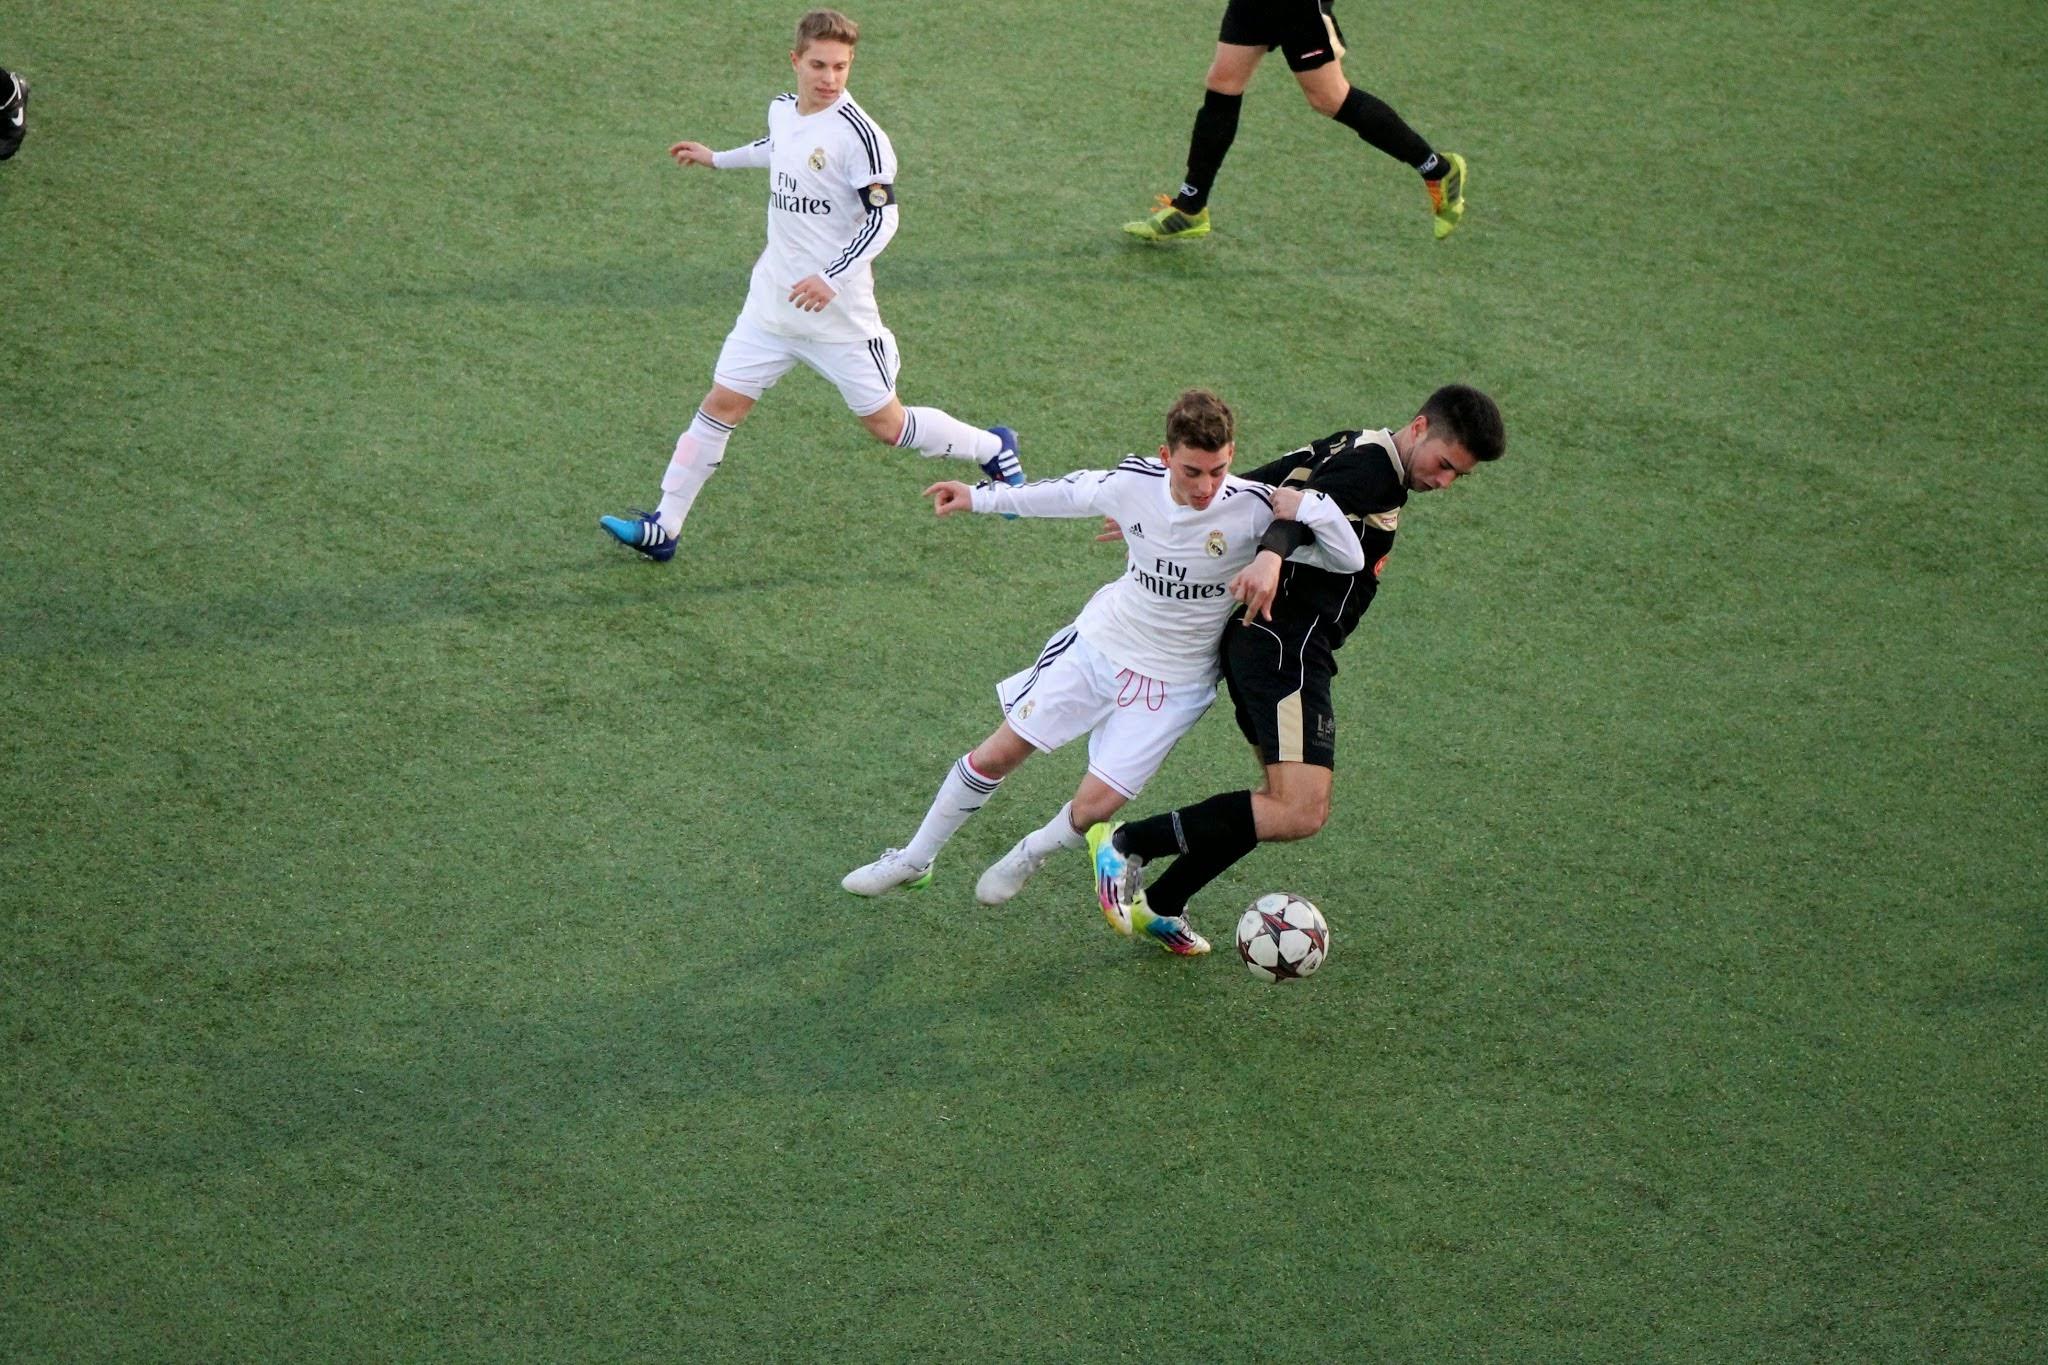 Fotos del partido amistoso Real Madrid Cadete A – EDM Juvenil C